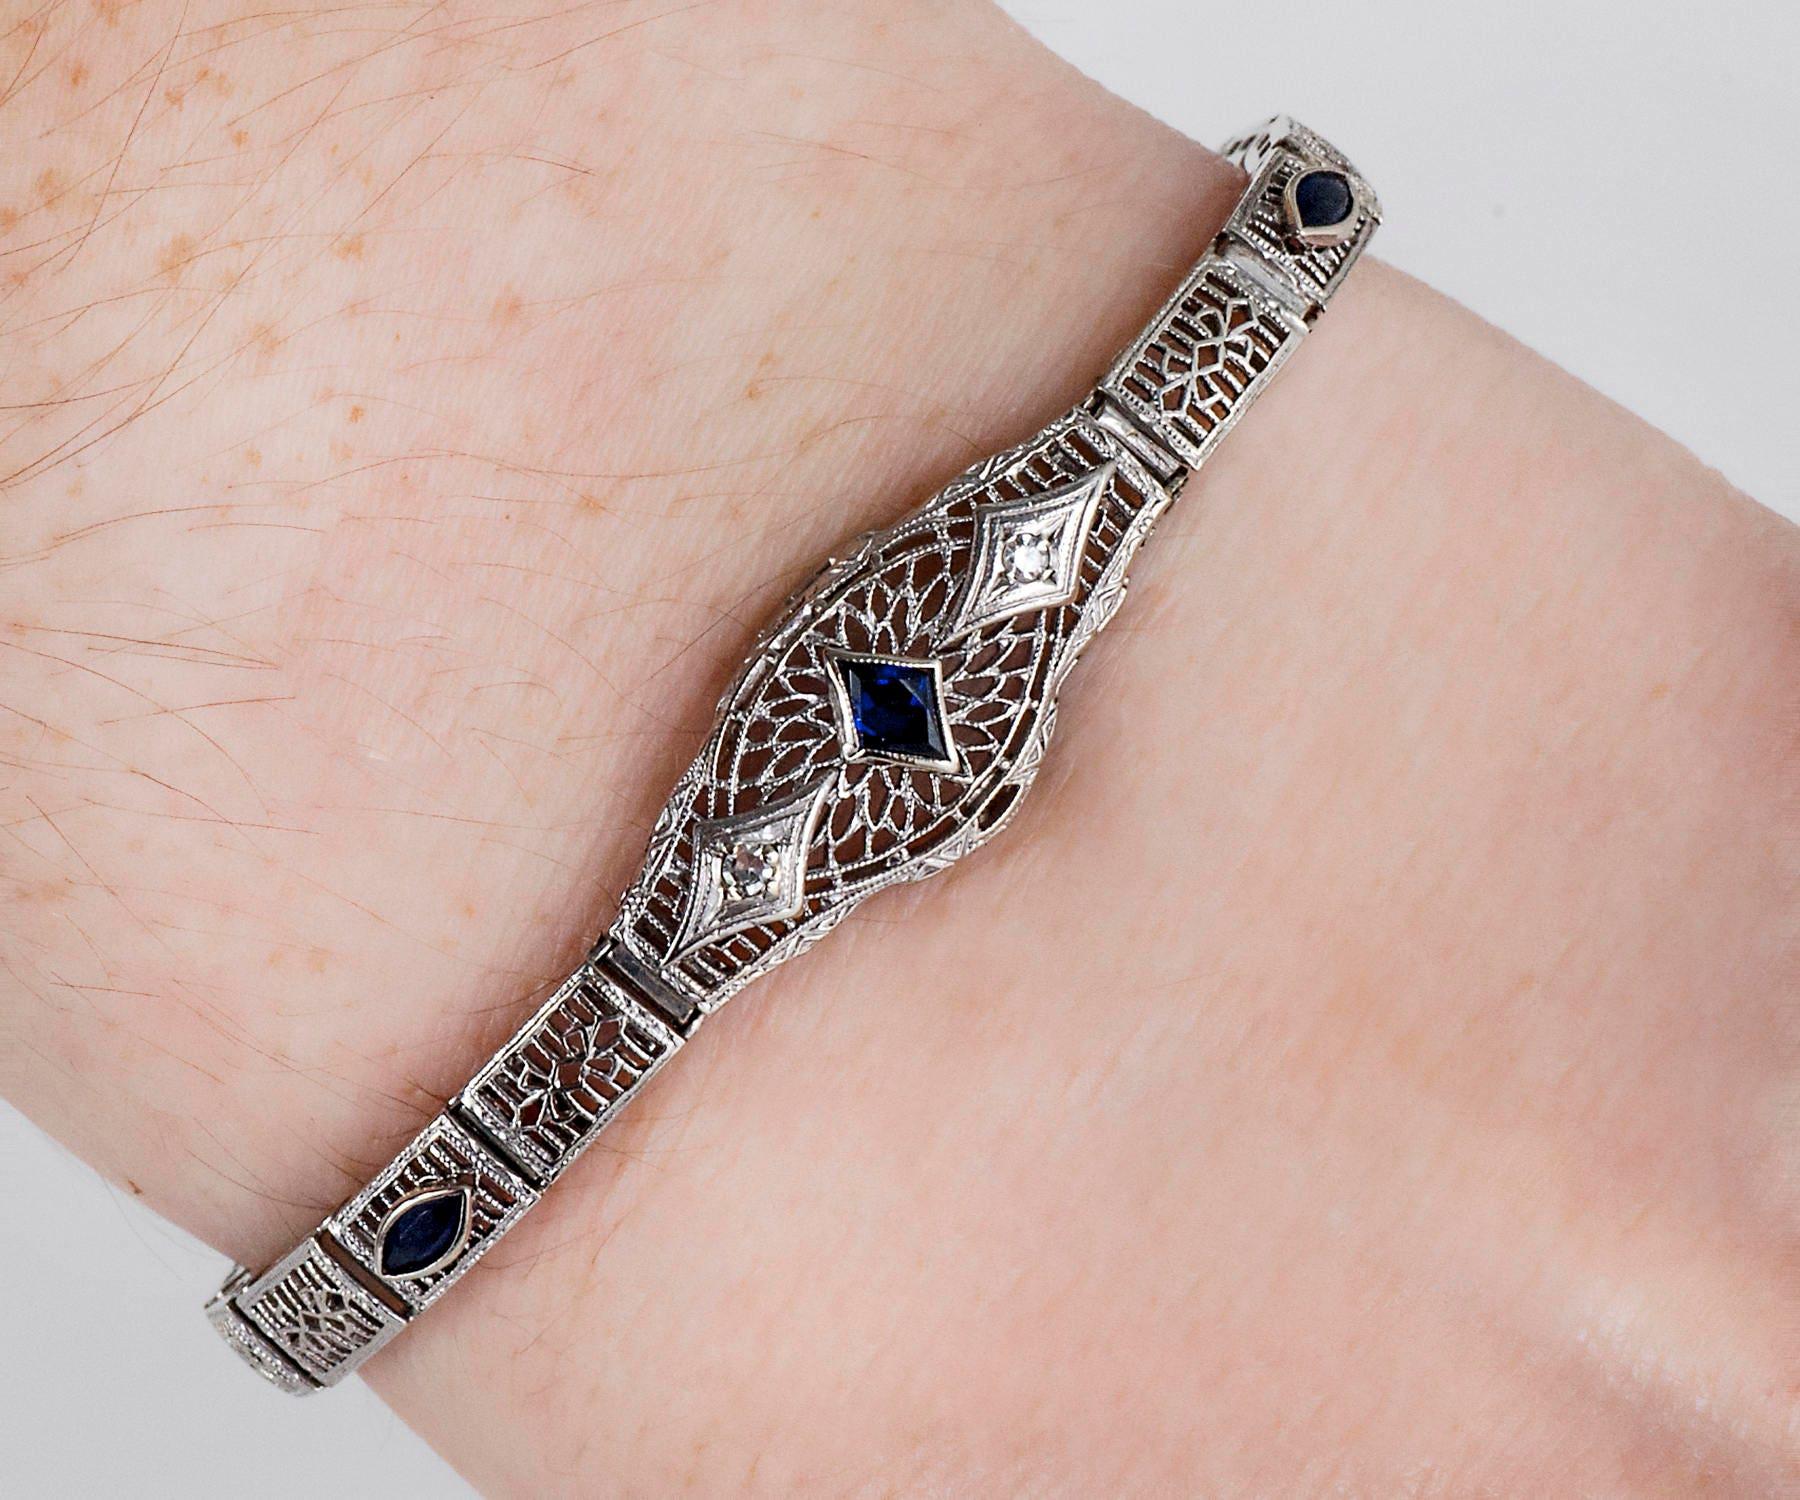 Antique Bracelet Antique Edwardian 14K White Gold Diamond